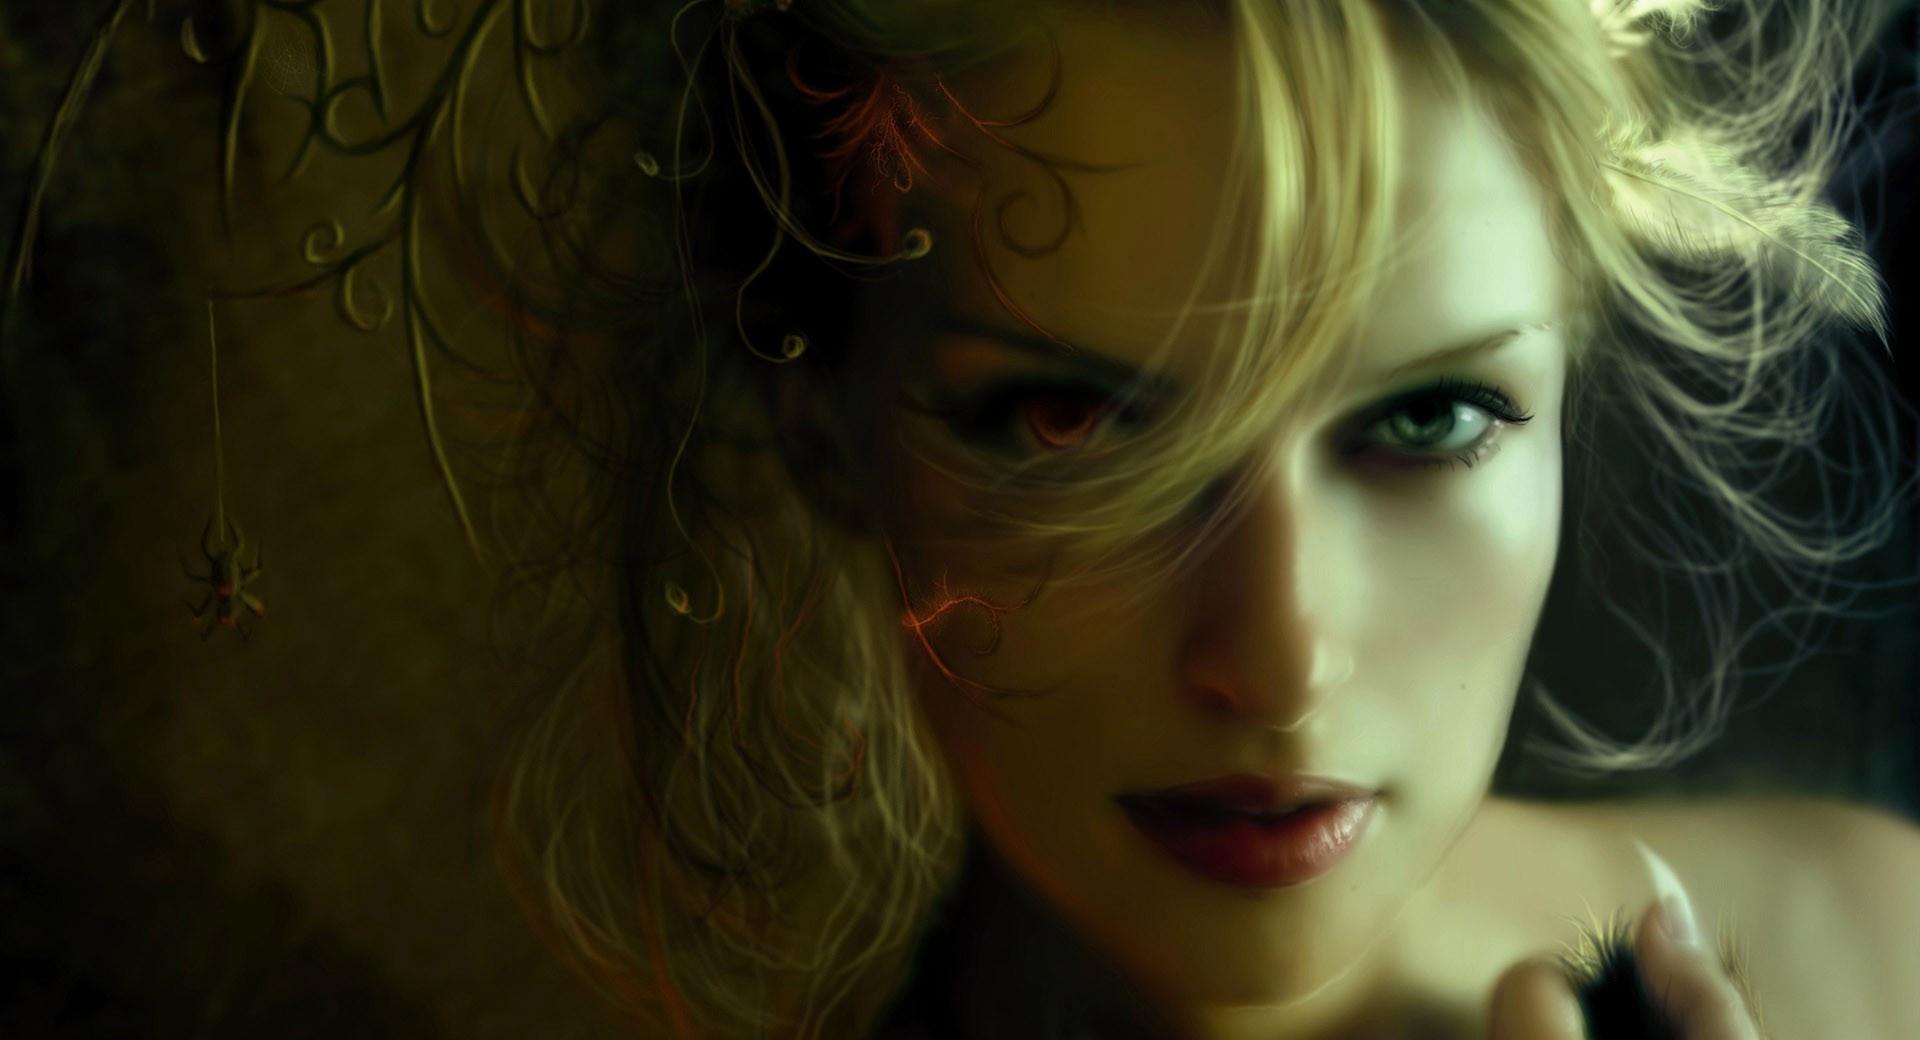 Beautiful Women, Fantasy wallpapers HD quality